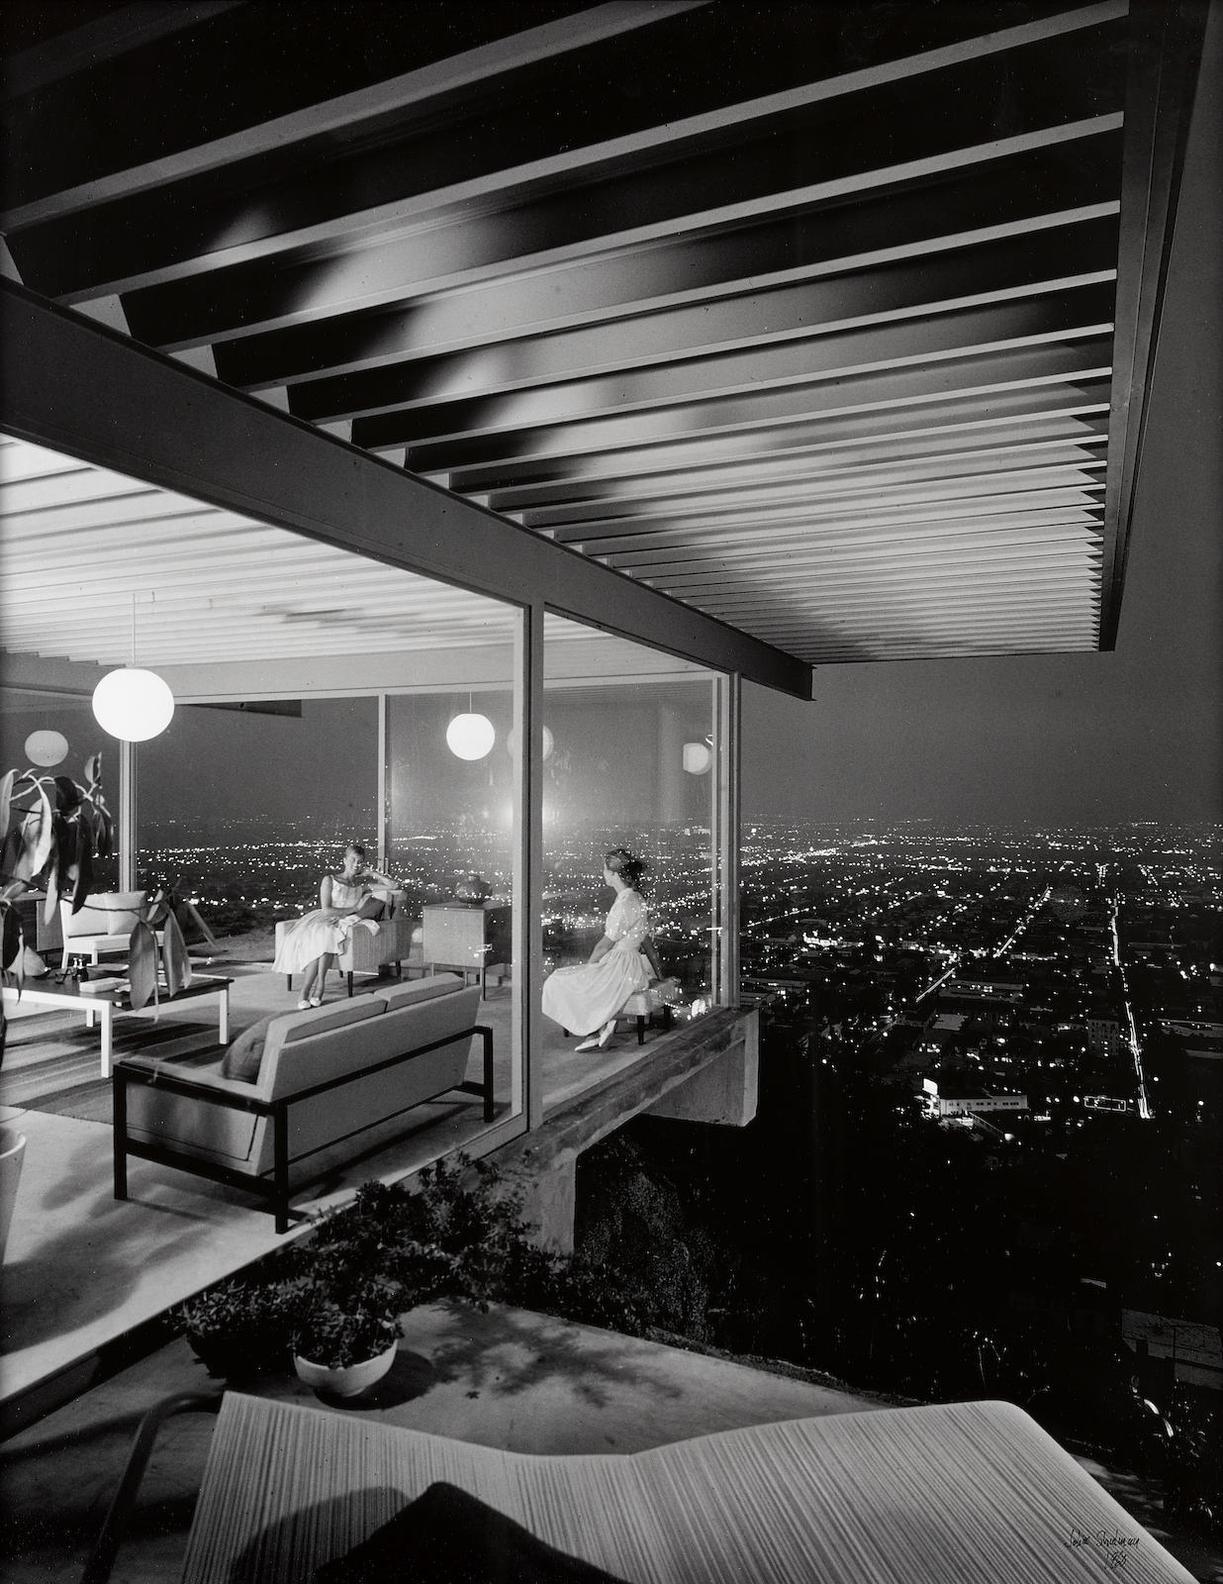 Julius Shulman-Case Study House #22, Pierre Koenig, Los Angeles, California-1960